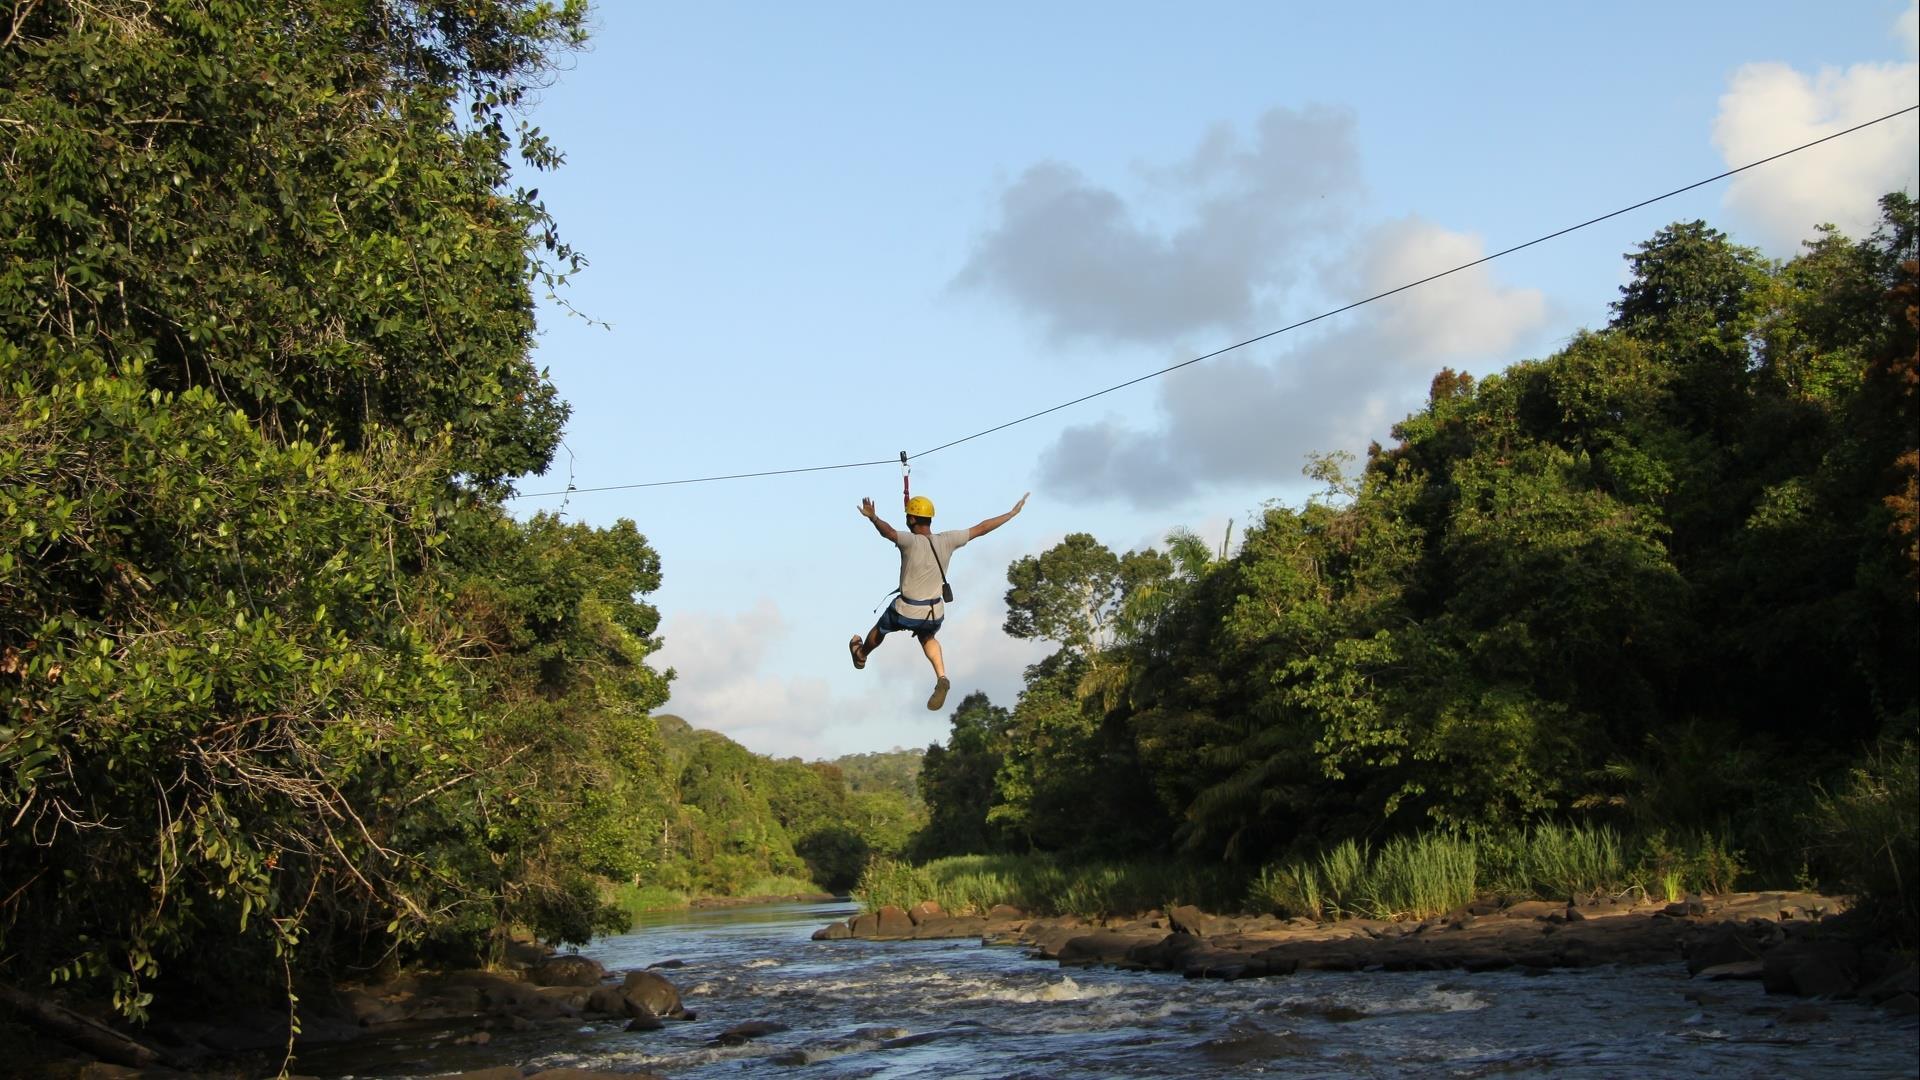 Brasilien Bahia: 5 Tage Reisebaustein - Nilo Pecanha und Boipeba naturnah erleben